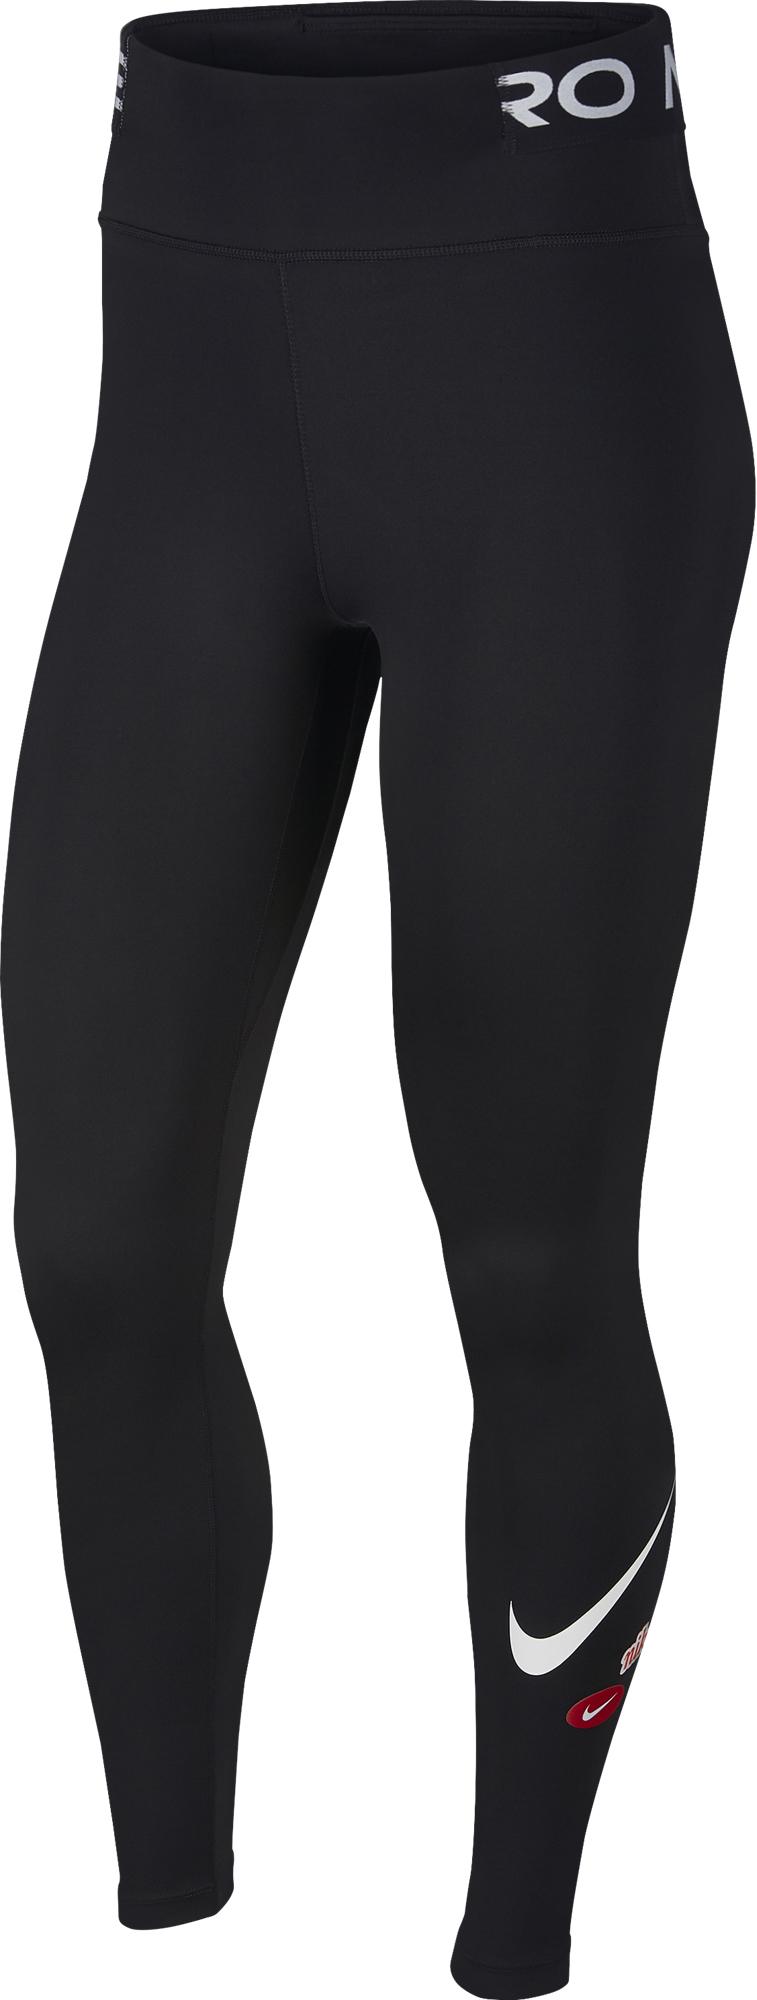 цена на Nike Легинсы женские Nike One, размер 42-44